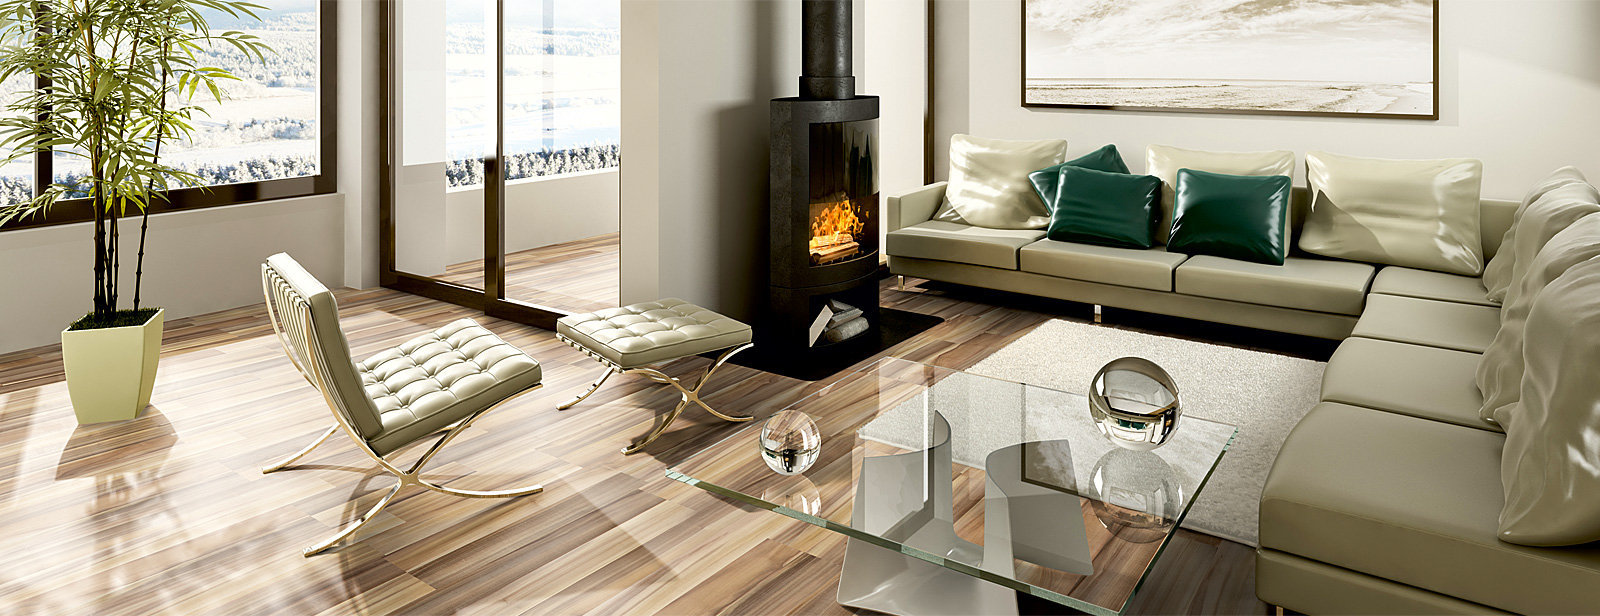 Podlaha v obývacím pokoji